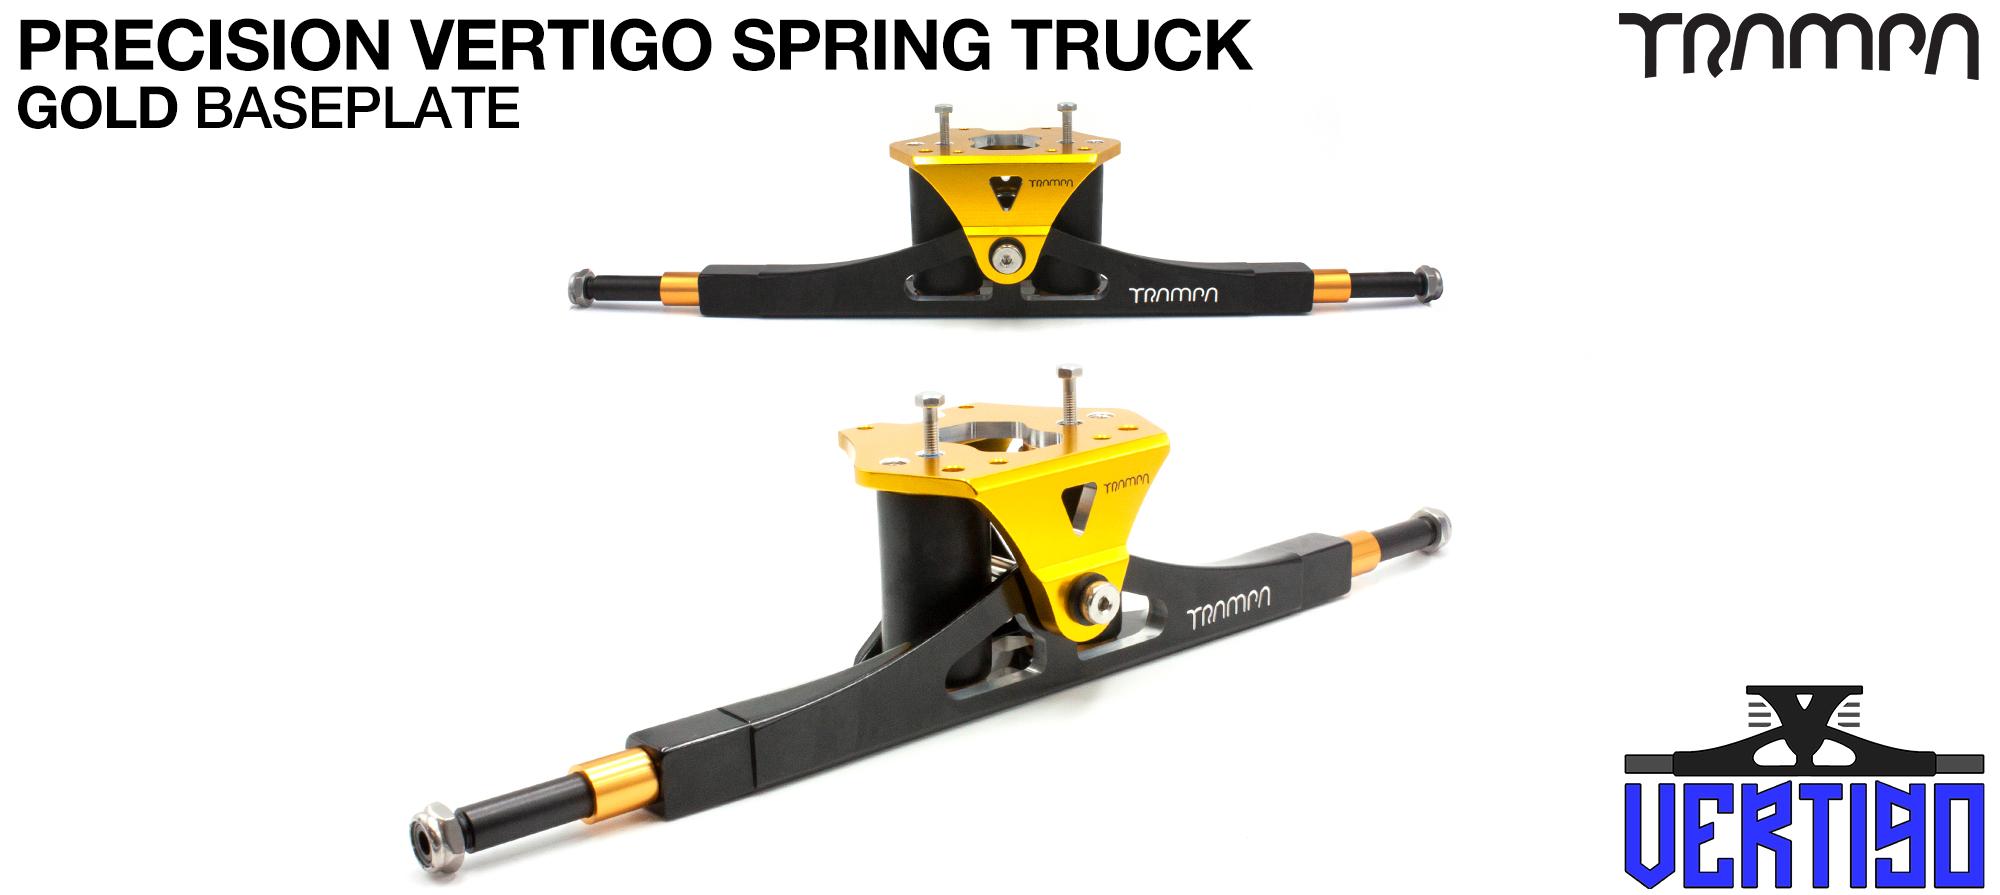 PRECISION CNC VERTIGO Truck Anodised GOLD  - 12mm Hollow Axles with GUNMETAL CNC baseplate Steel Kingpin TRAMPA Spring Trucks